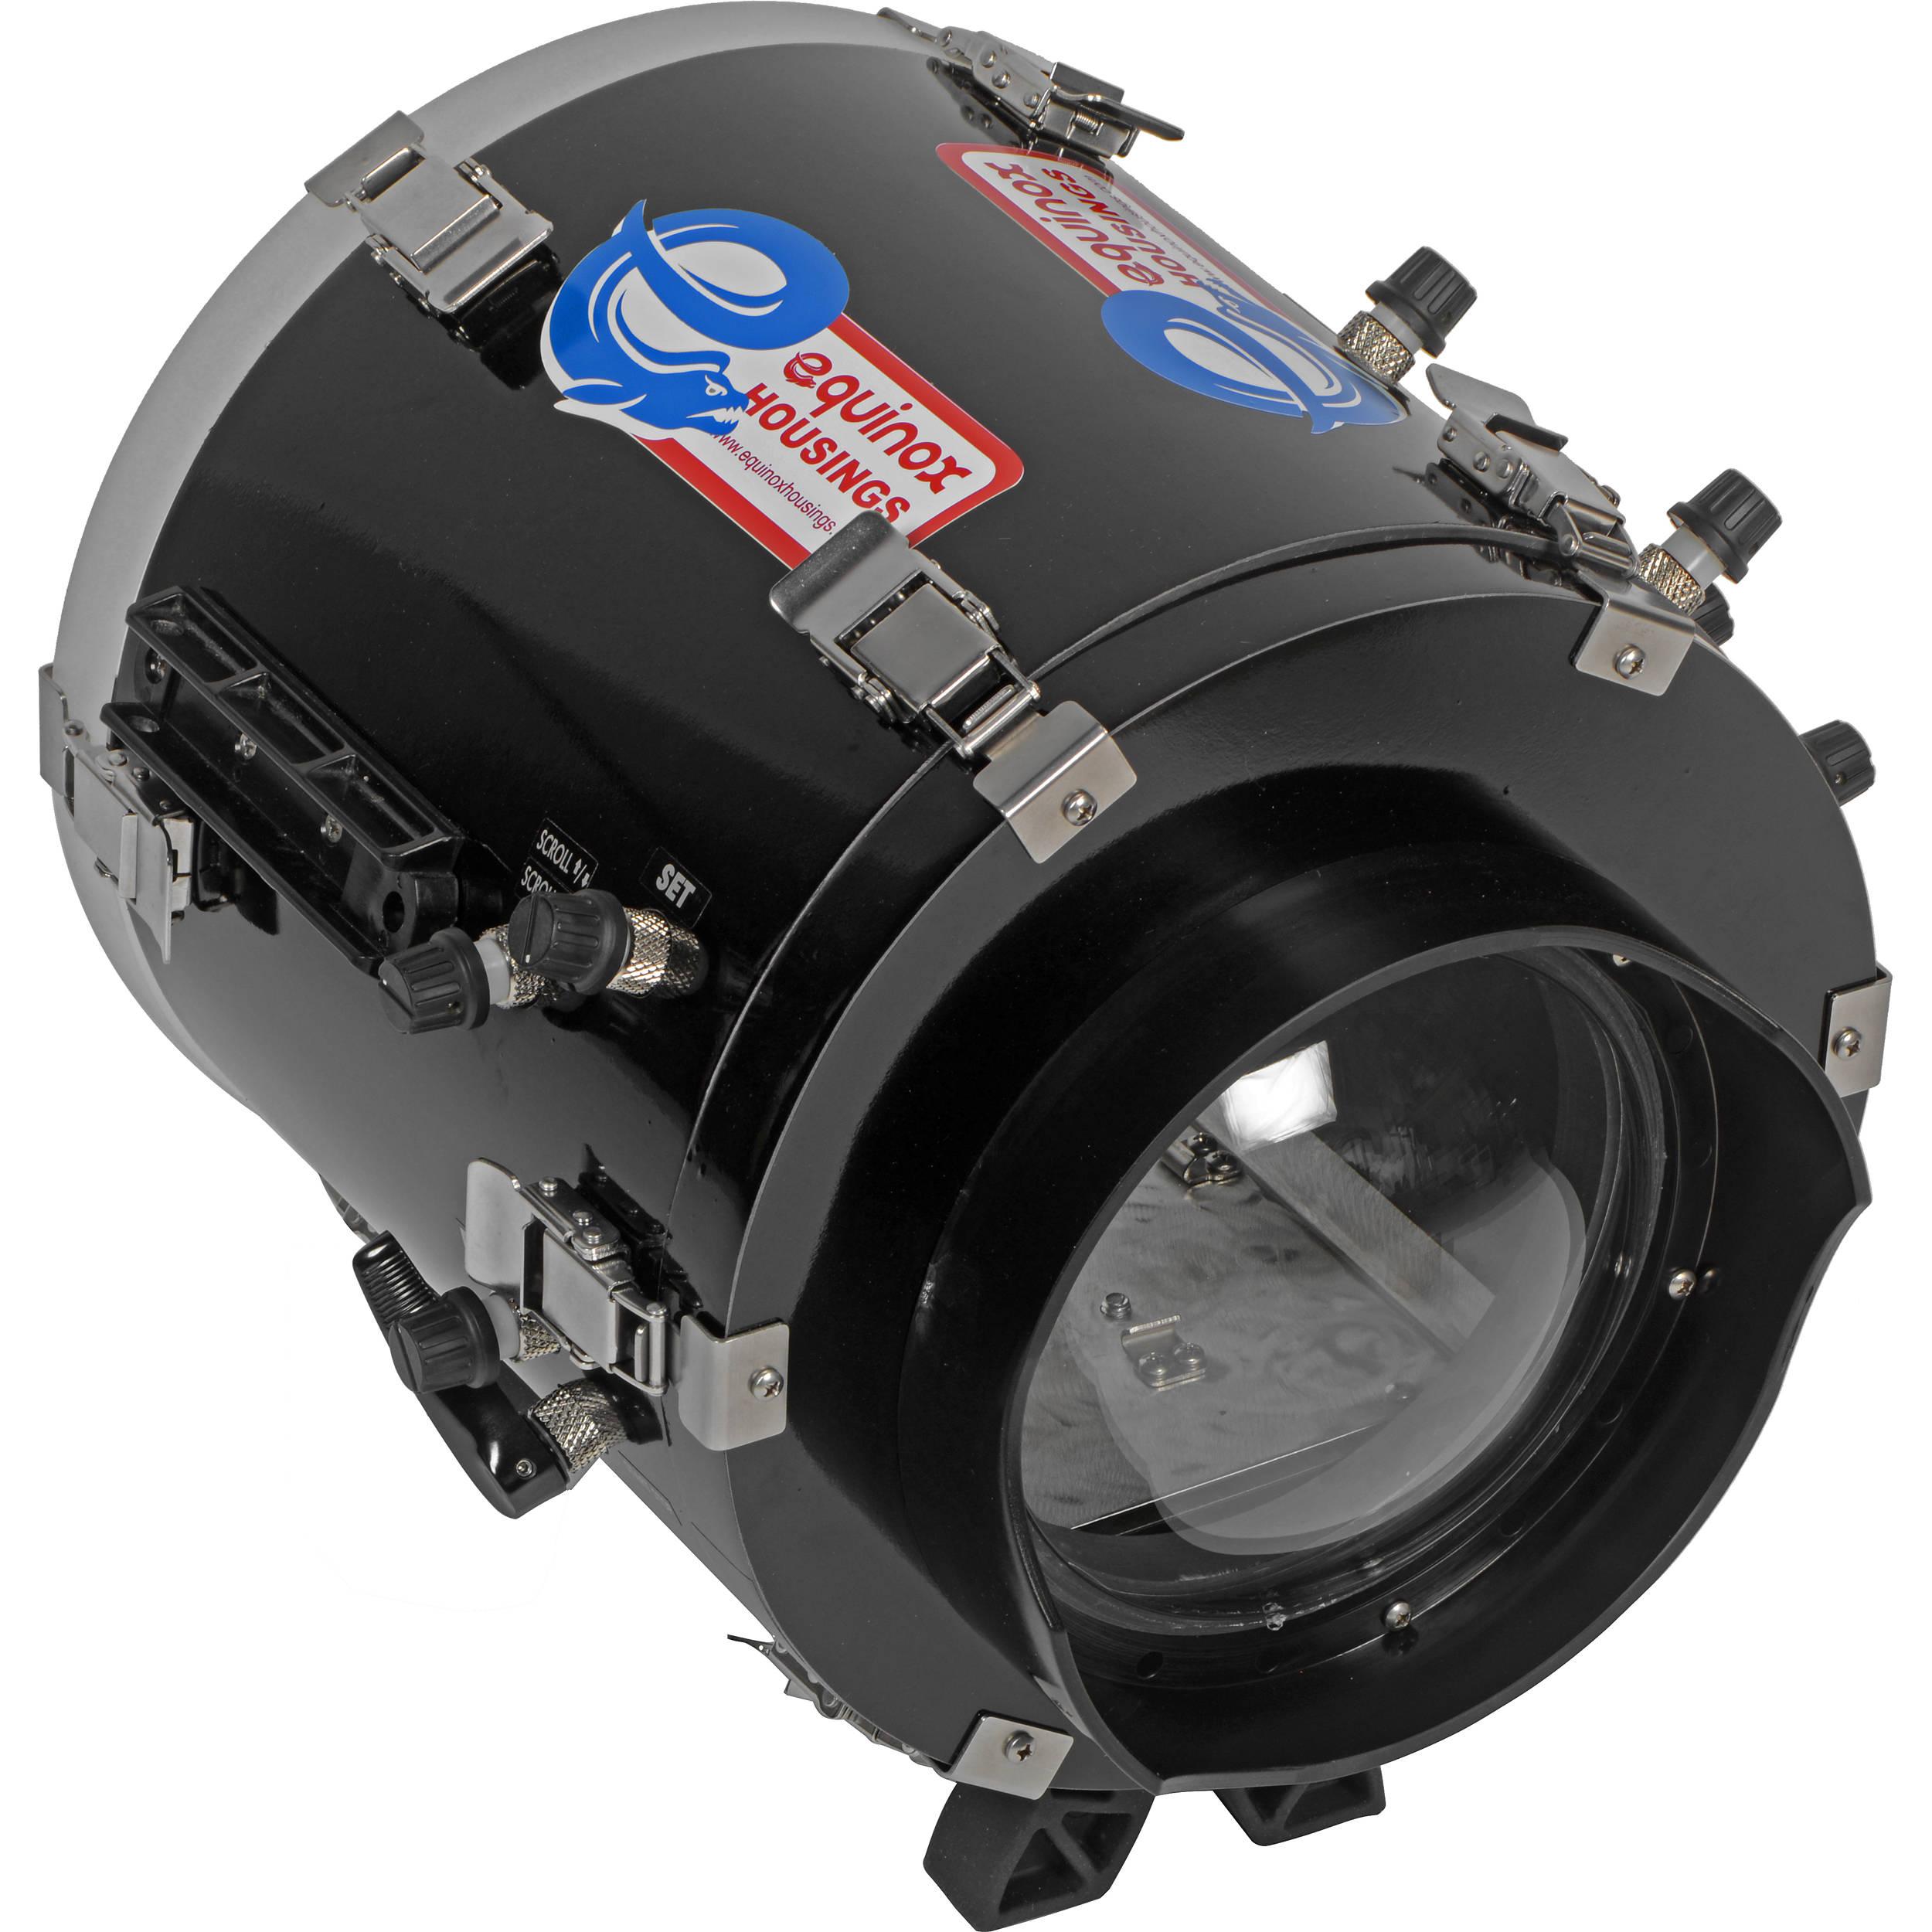 Equinox Underwater Housing for Canon EOS C100 Mark II Cinema Camera and  16-35mm Lens